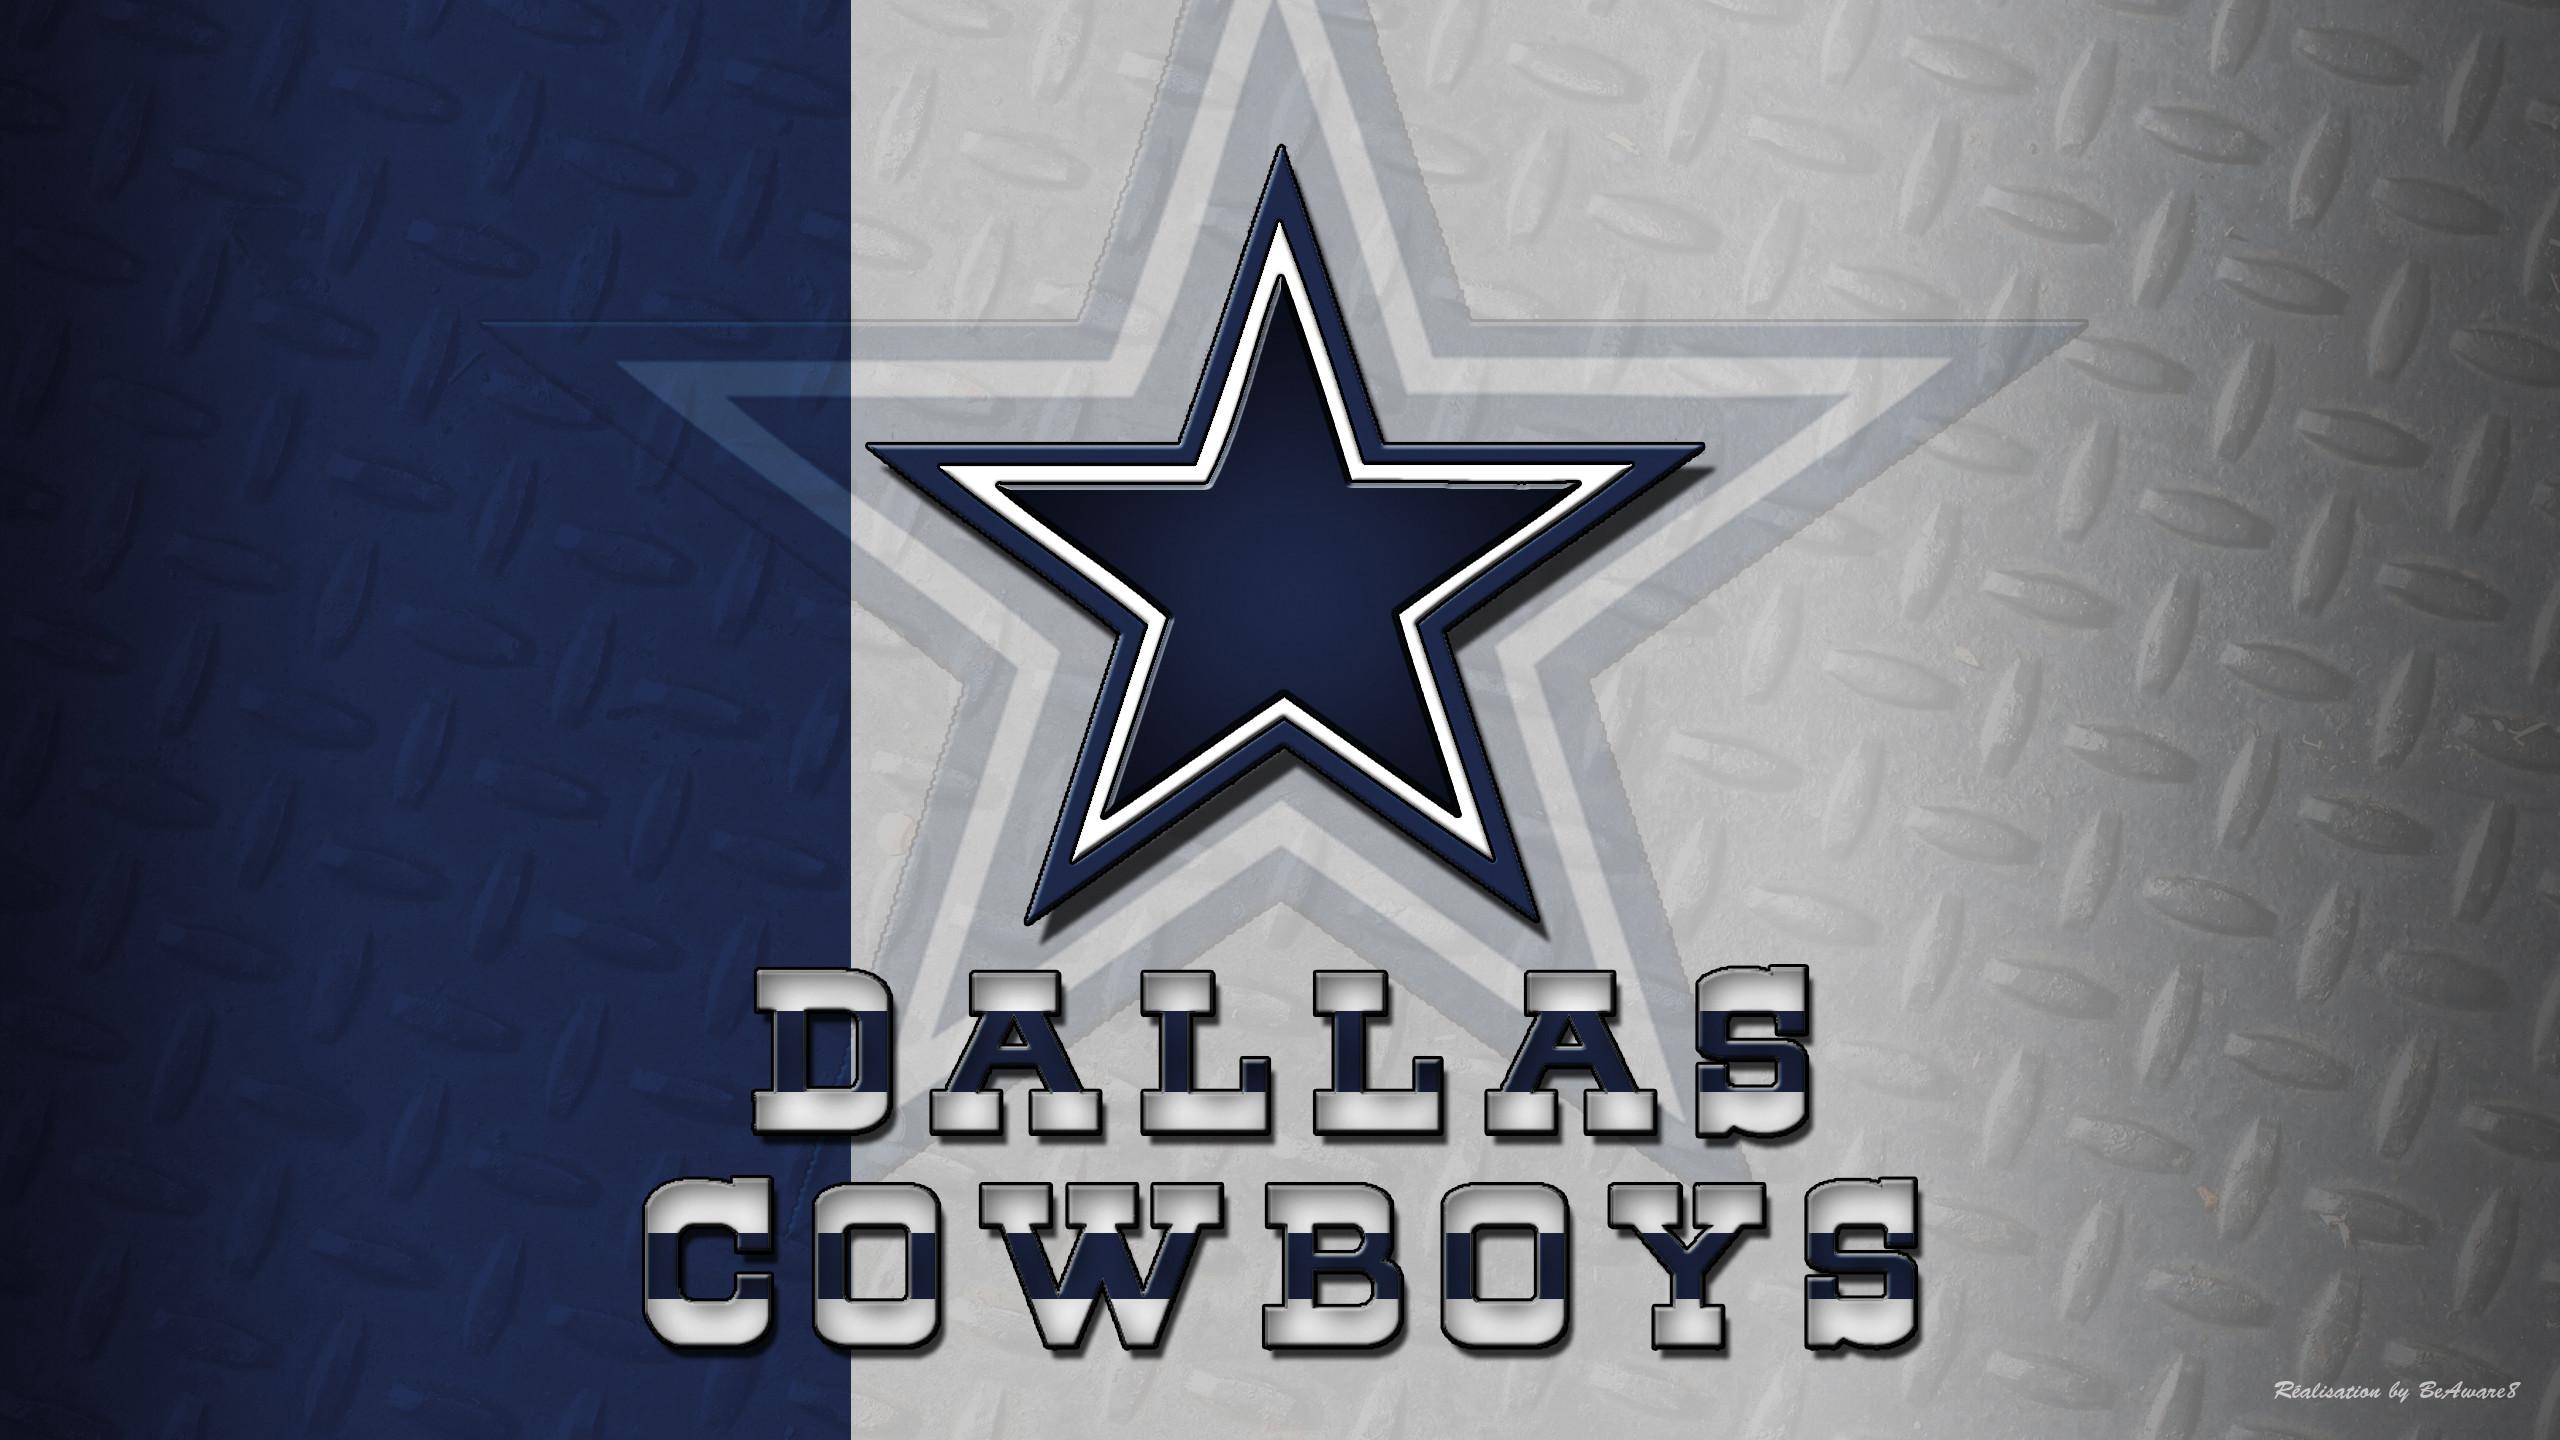 Dallas cowboys 2018 wallpapers 55 images free desktop wallpapers 43 dallas cowboys schedule wallpaper voltagebd Choice Image